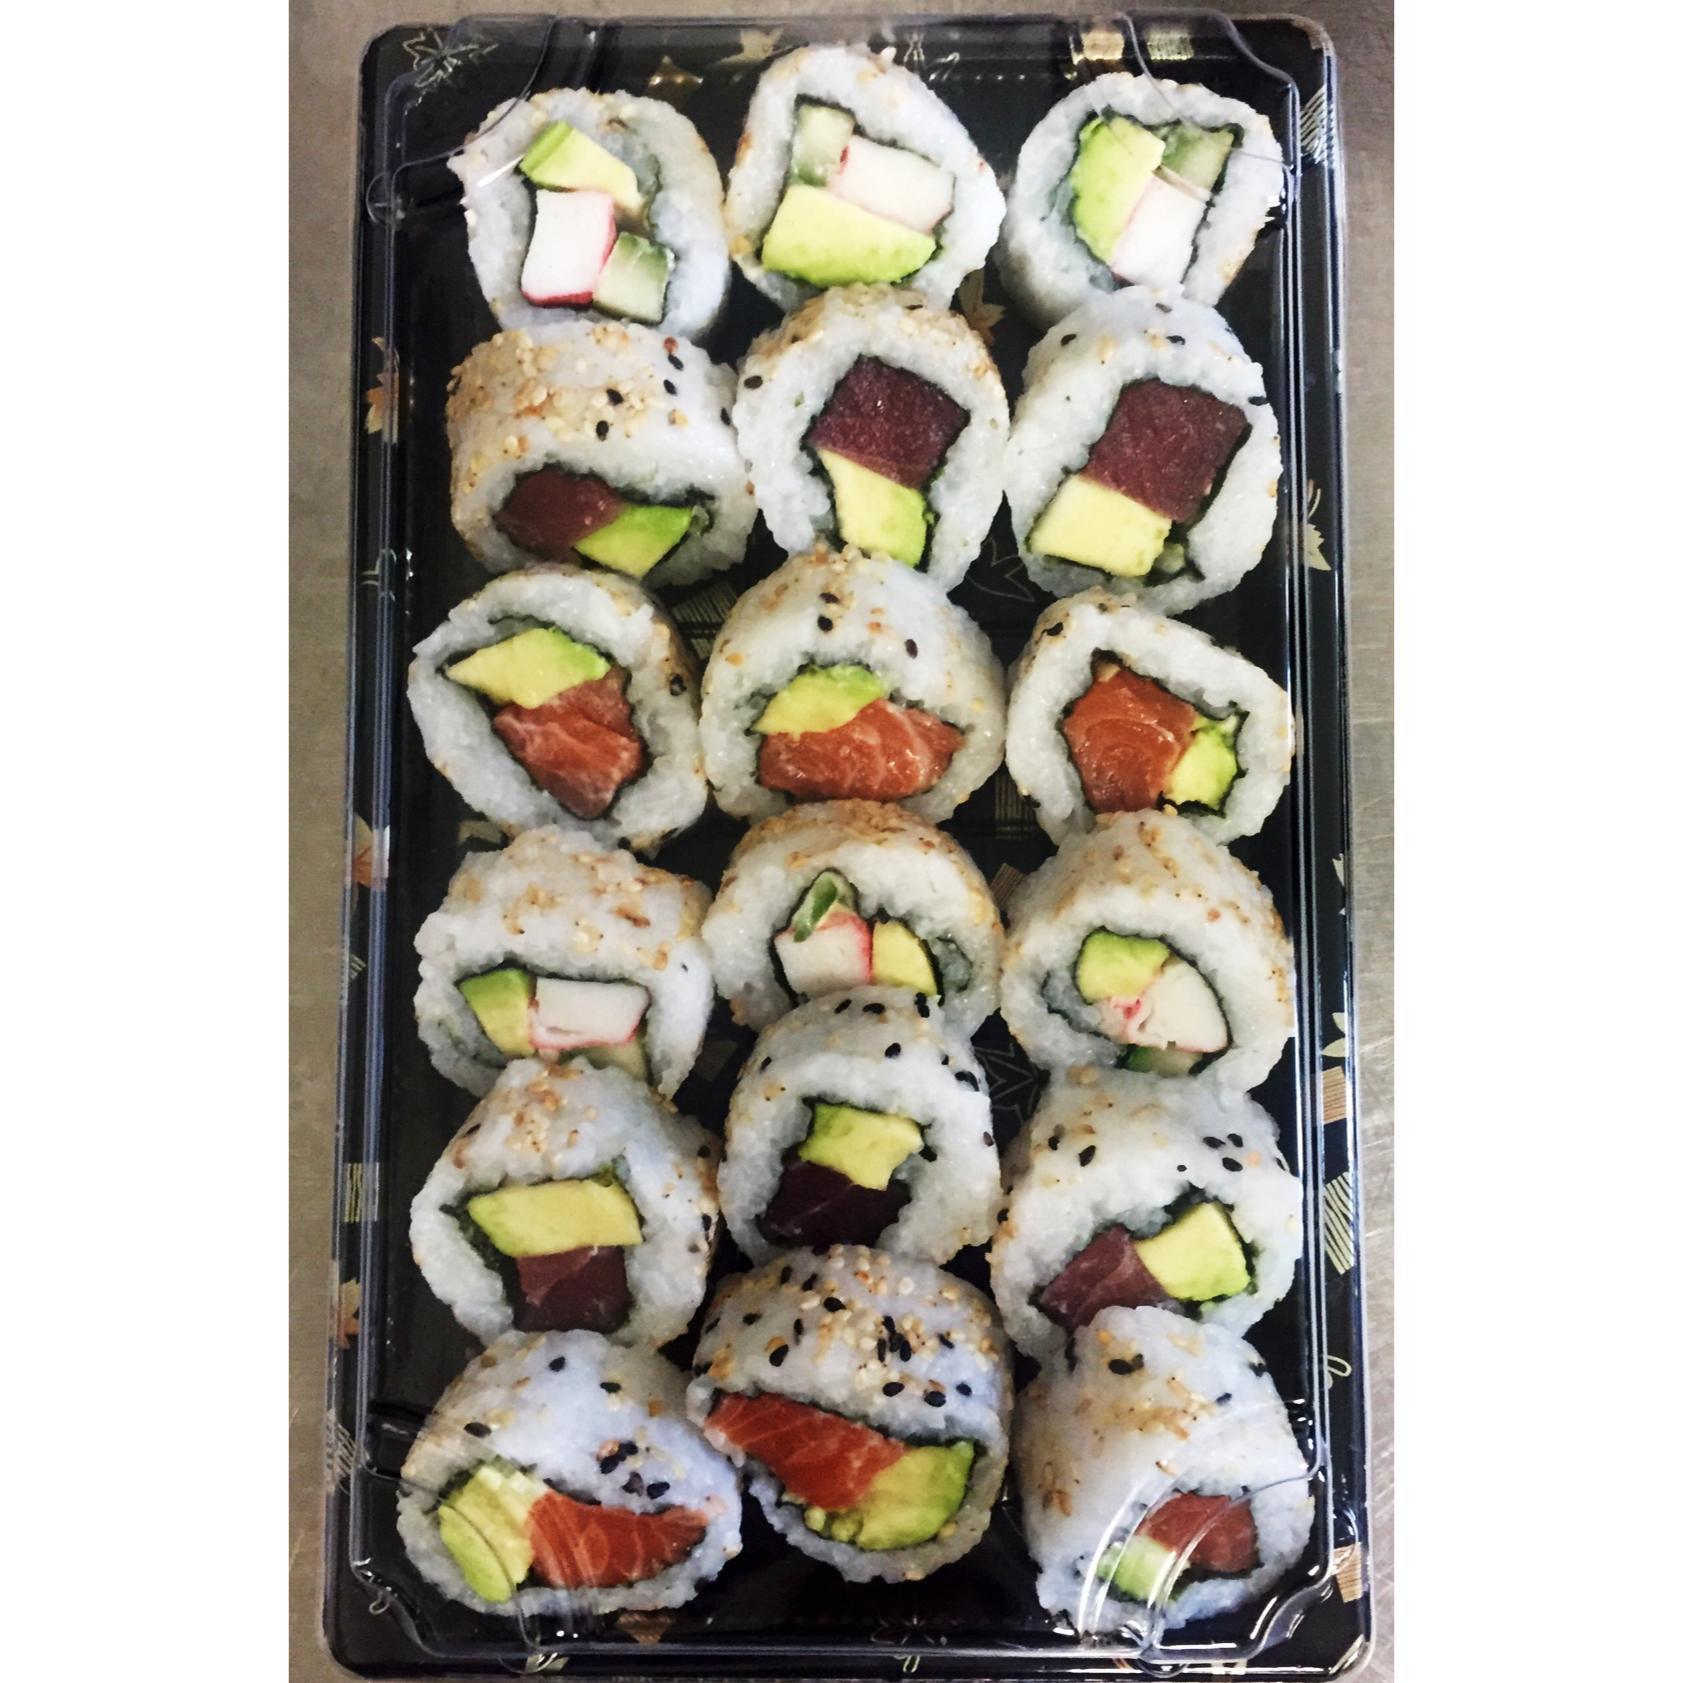 The Uramaki Box - £14   Includes a mix of 18 inside out rolls including california rolls, salmon & avocado and tuna & avocado